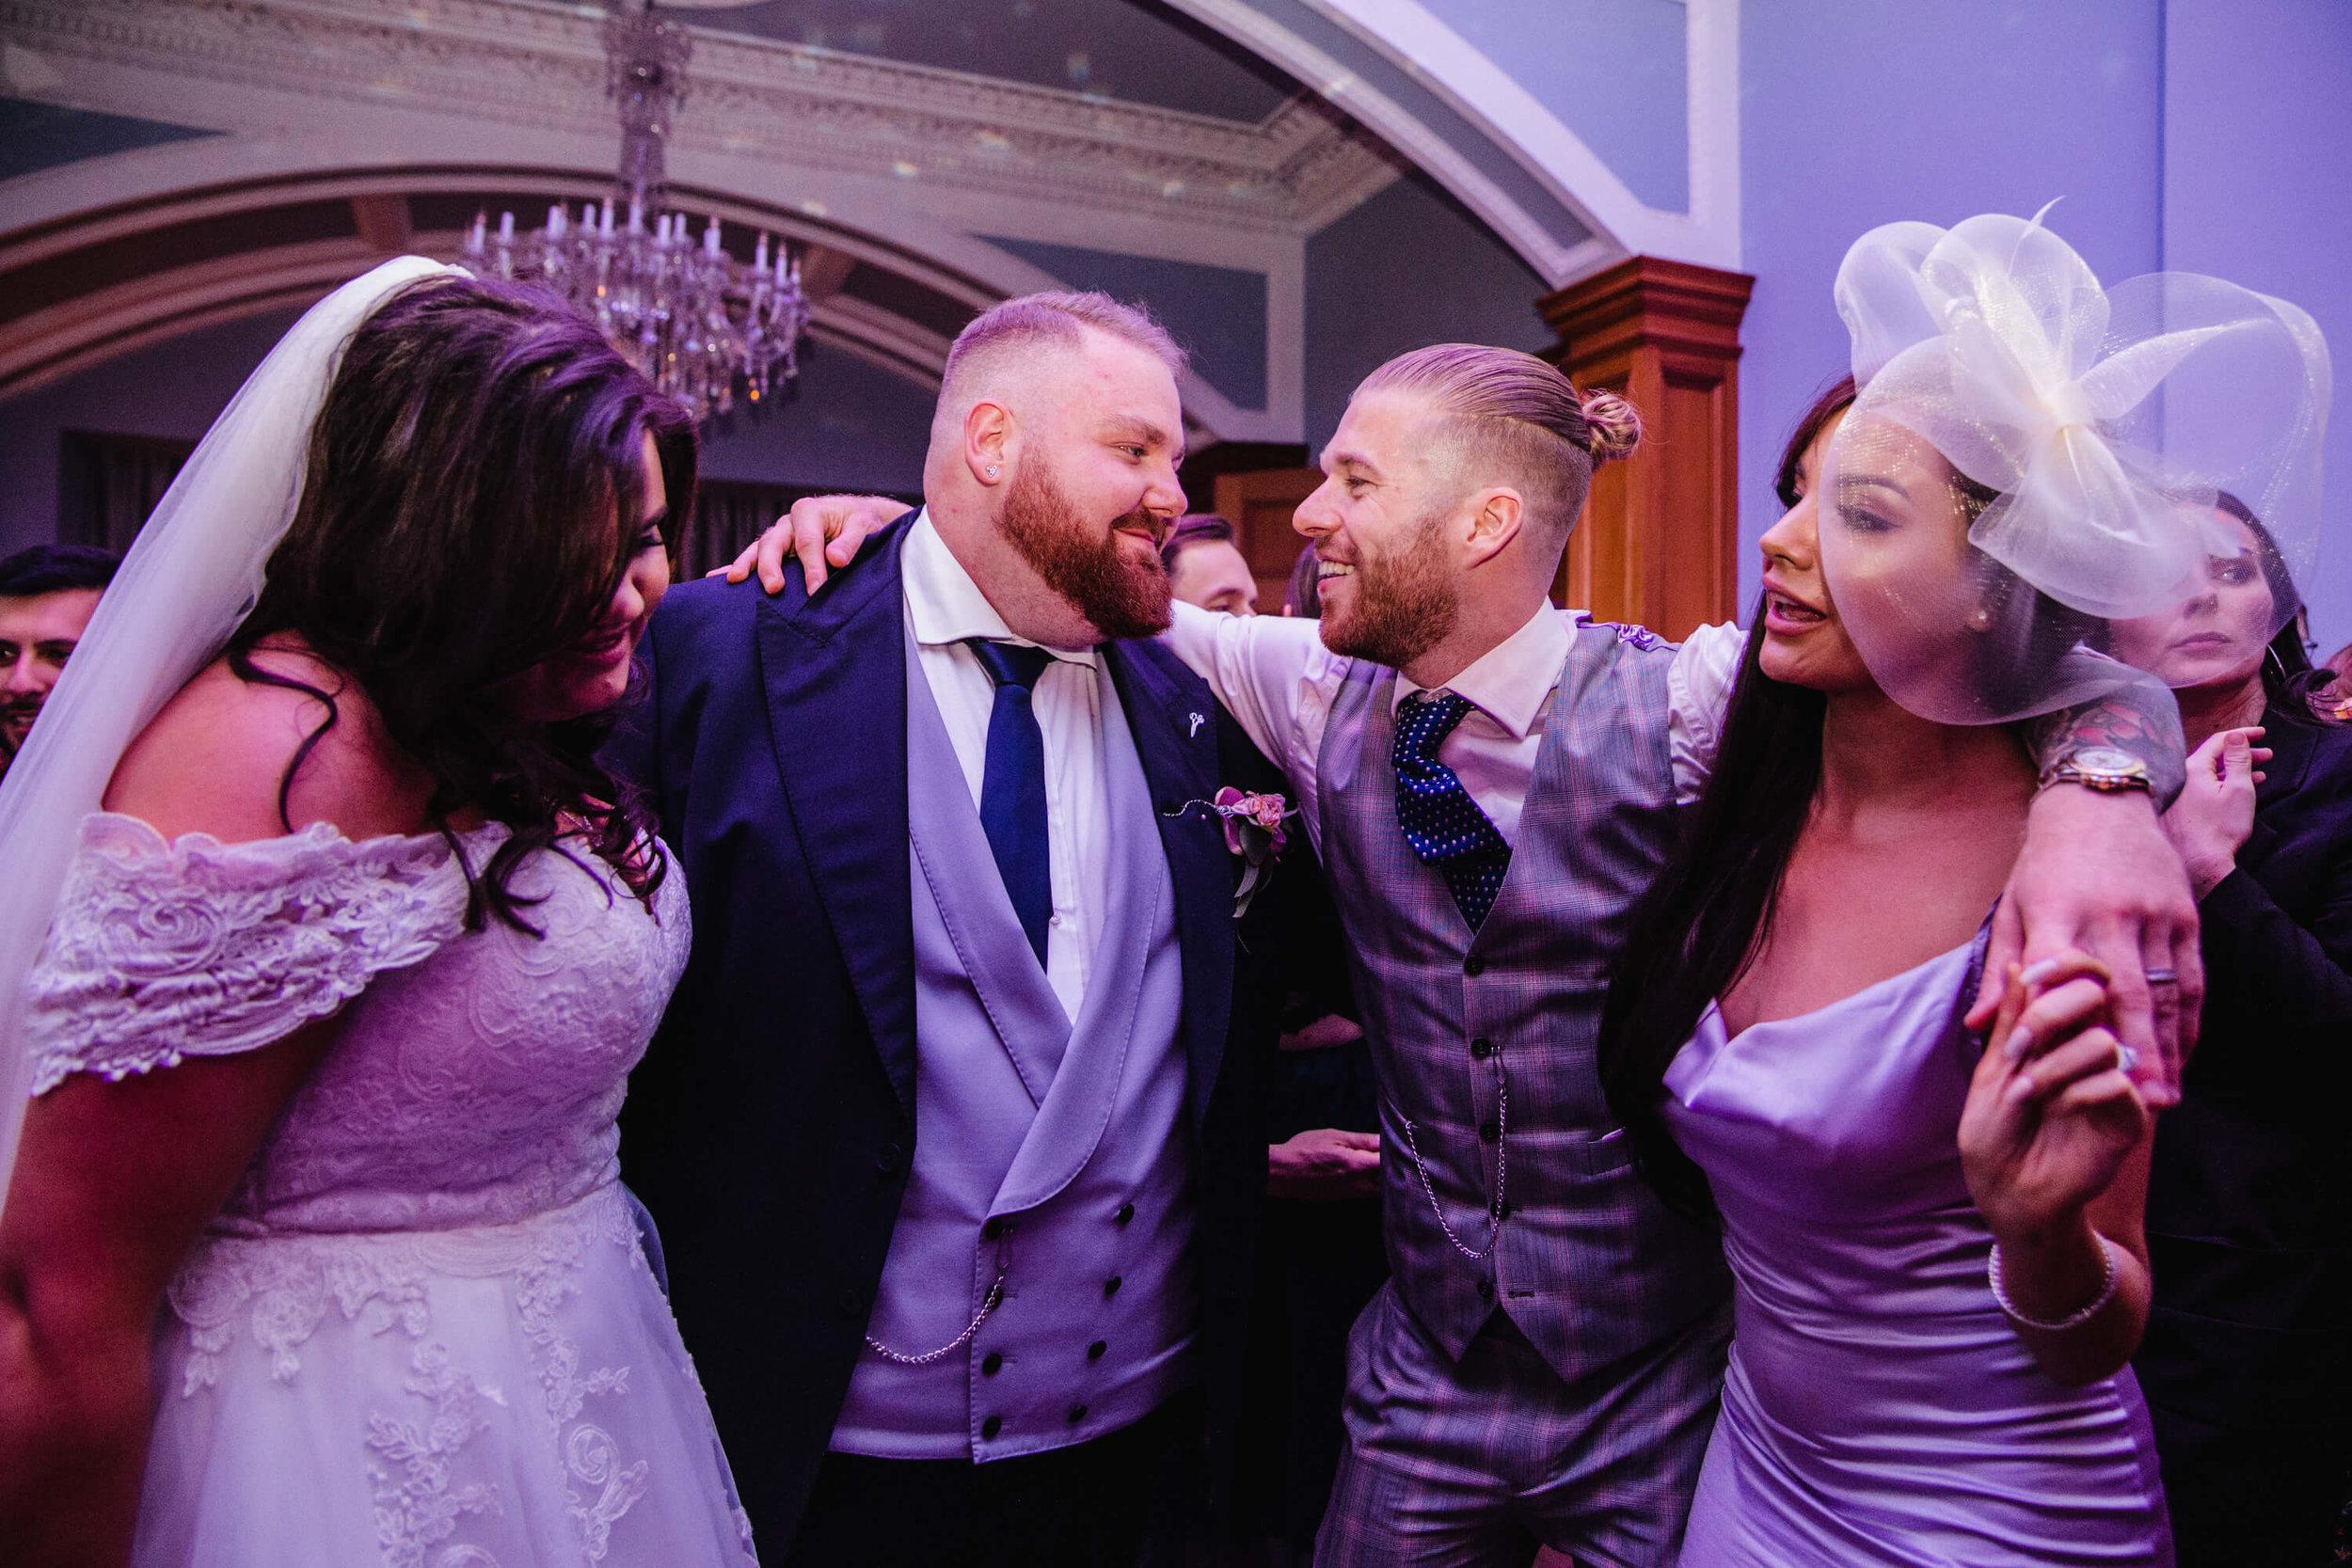 newlyweds exchange hug and congratulations on dancefloor at haigh hall